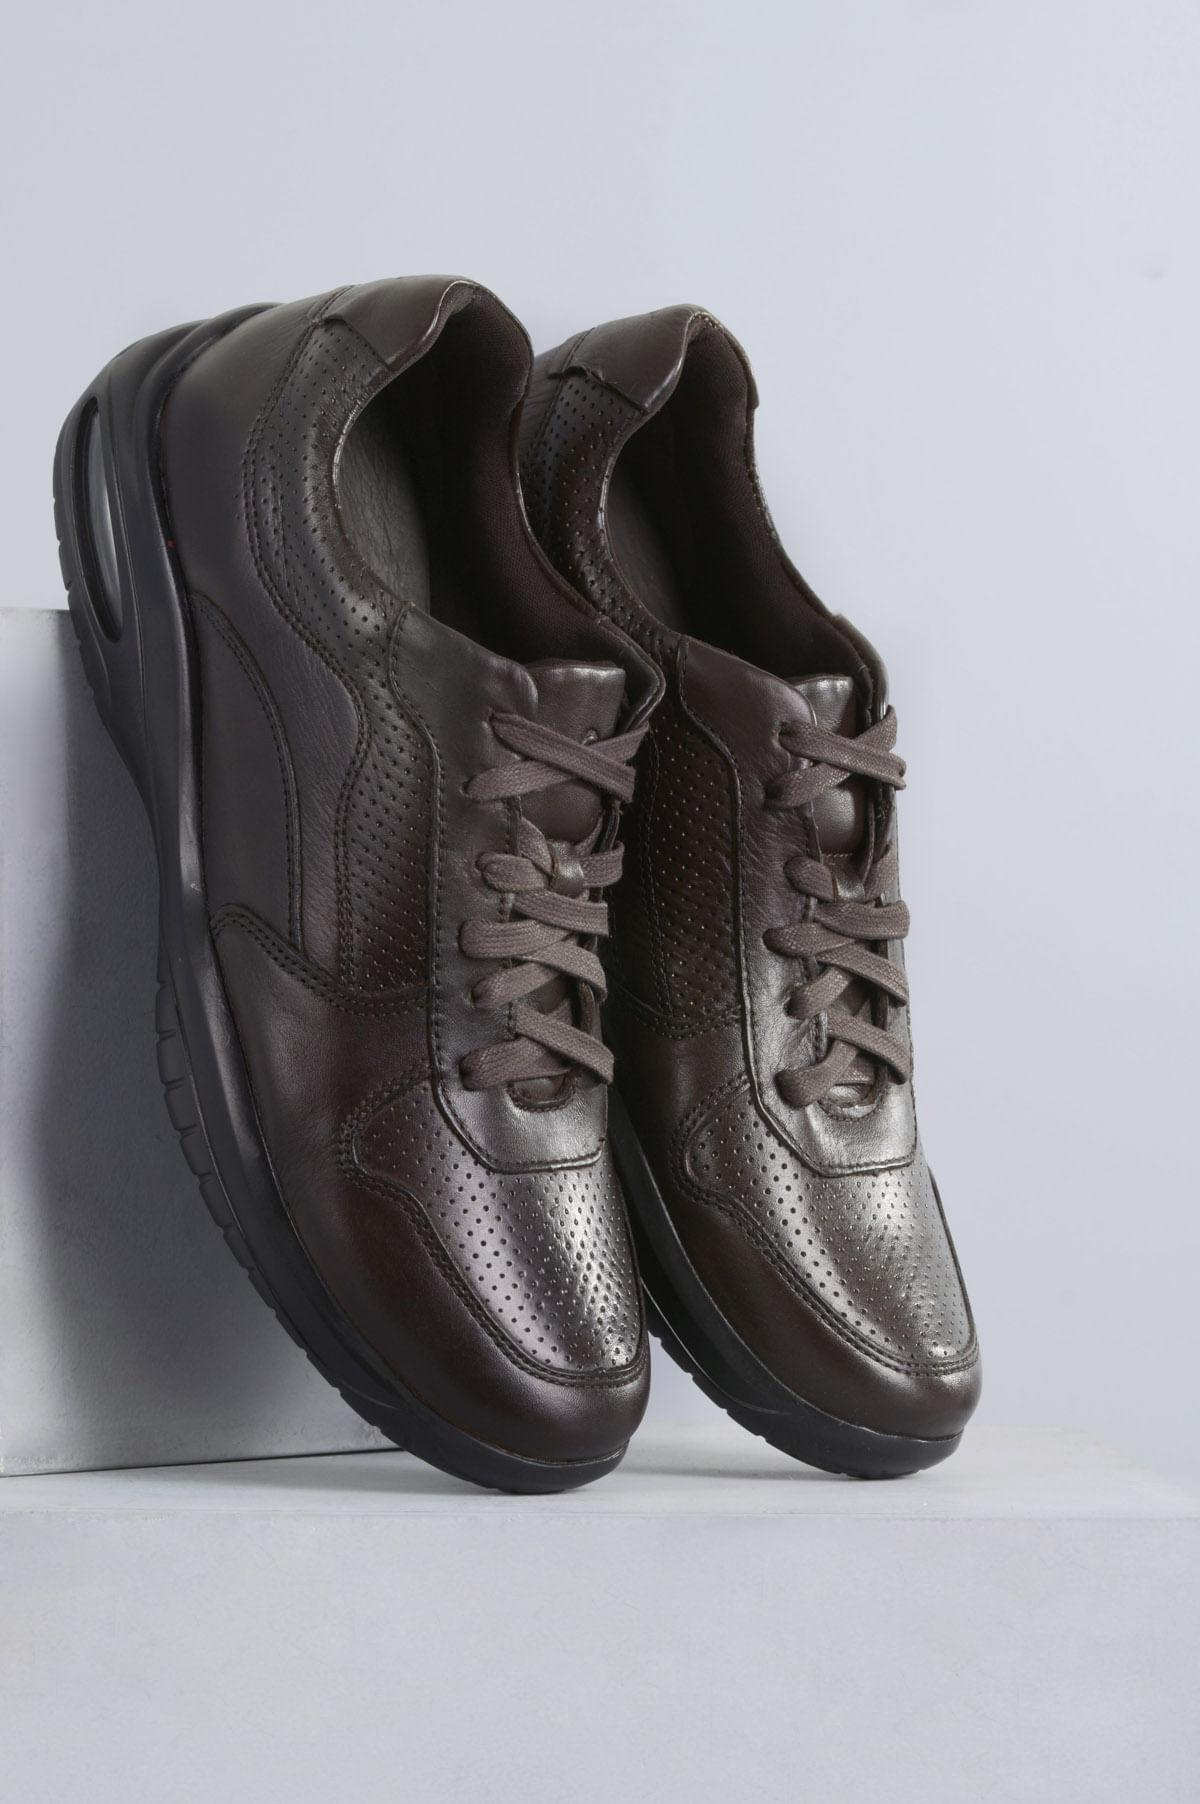 c5e41ea70 Sapato Masculino Democrata Air Motion CR - CAFE - Mundial Calçados